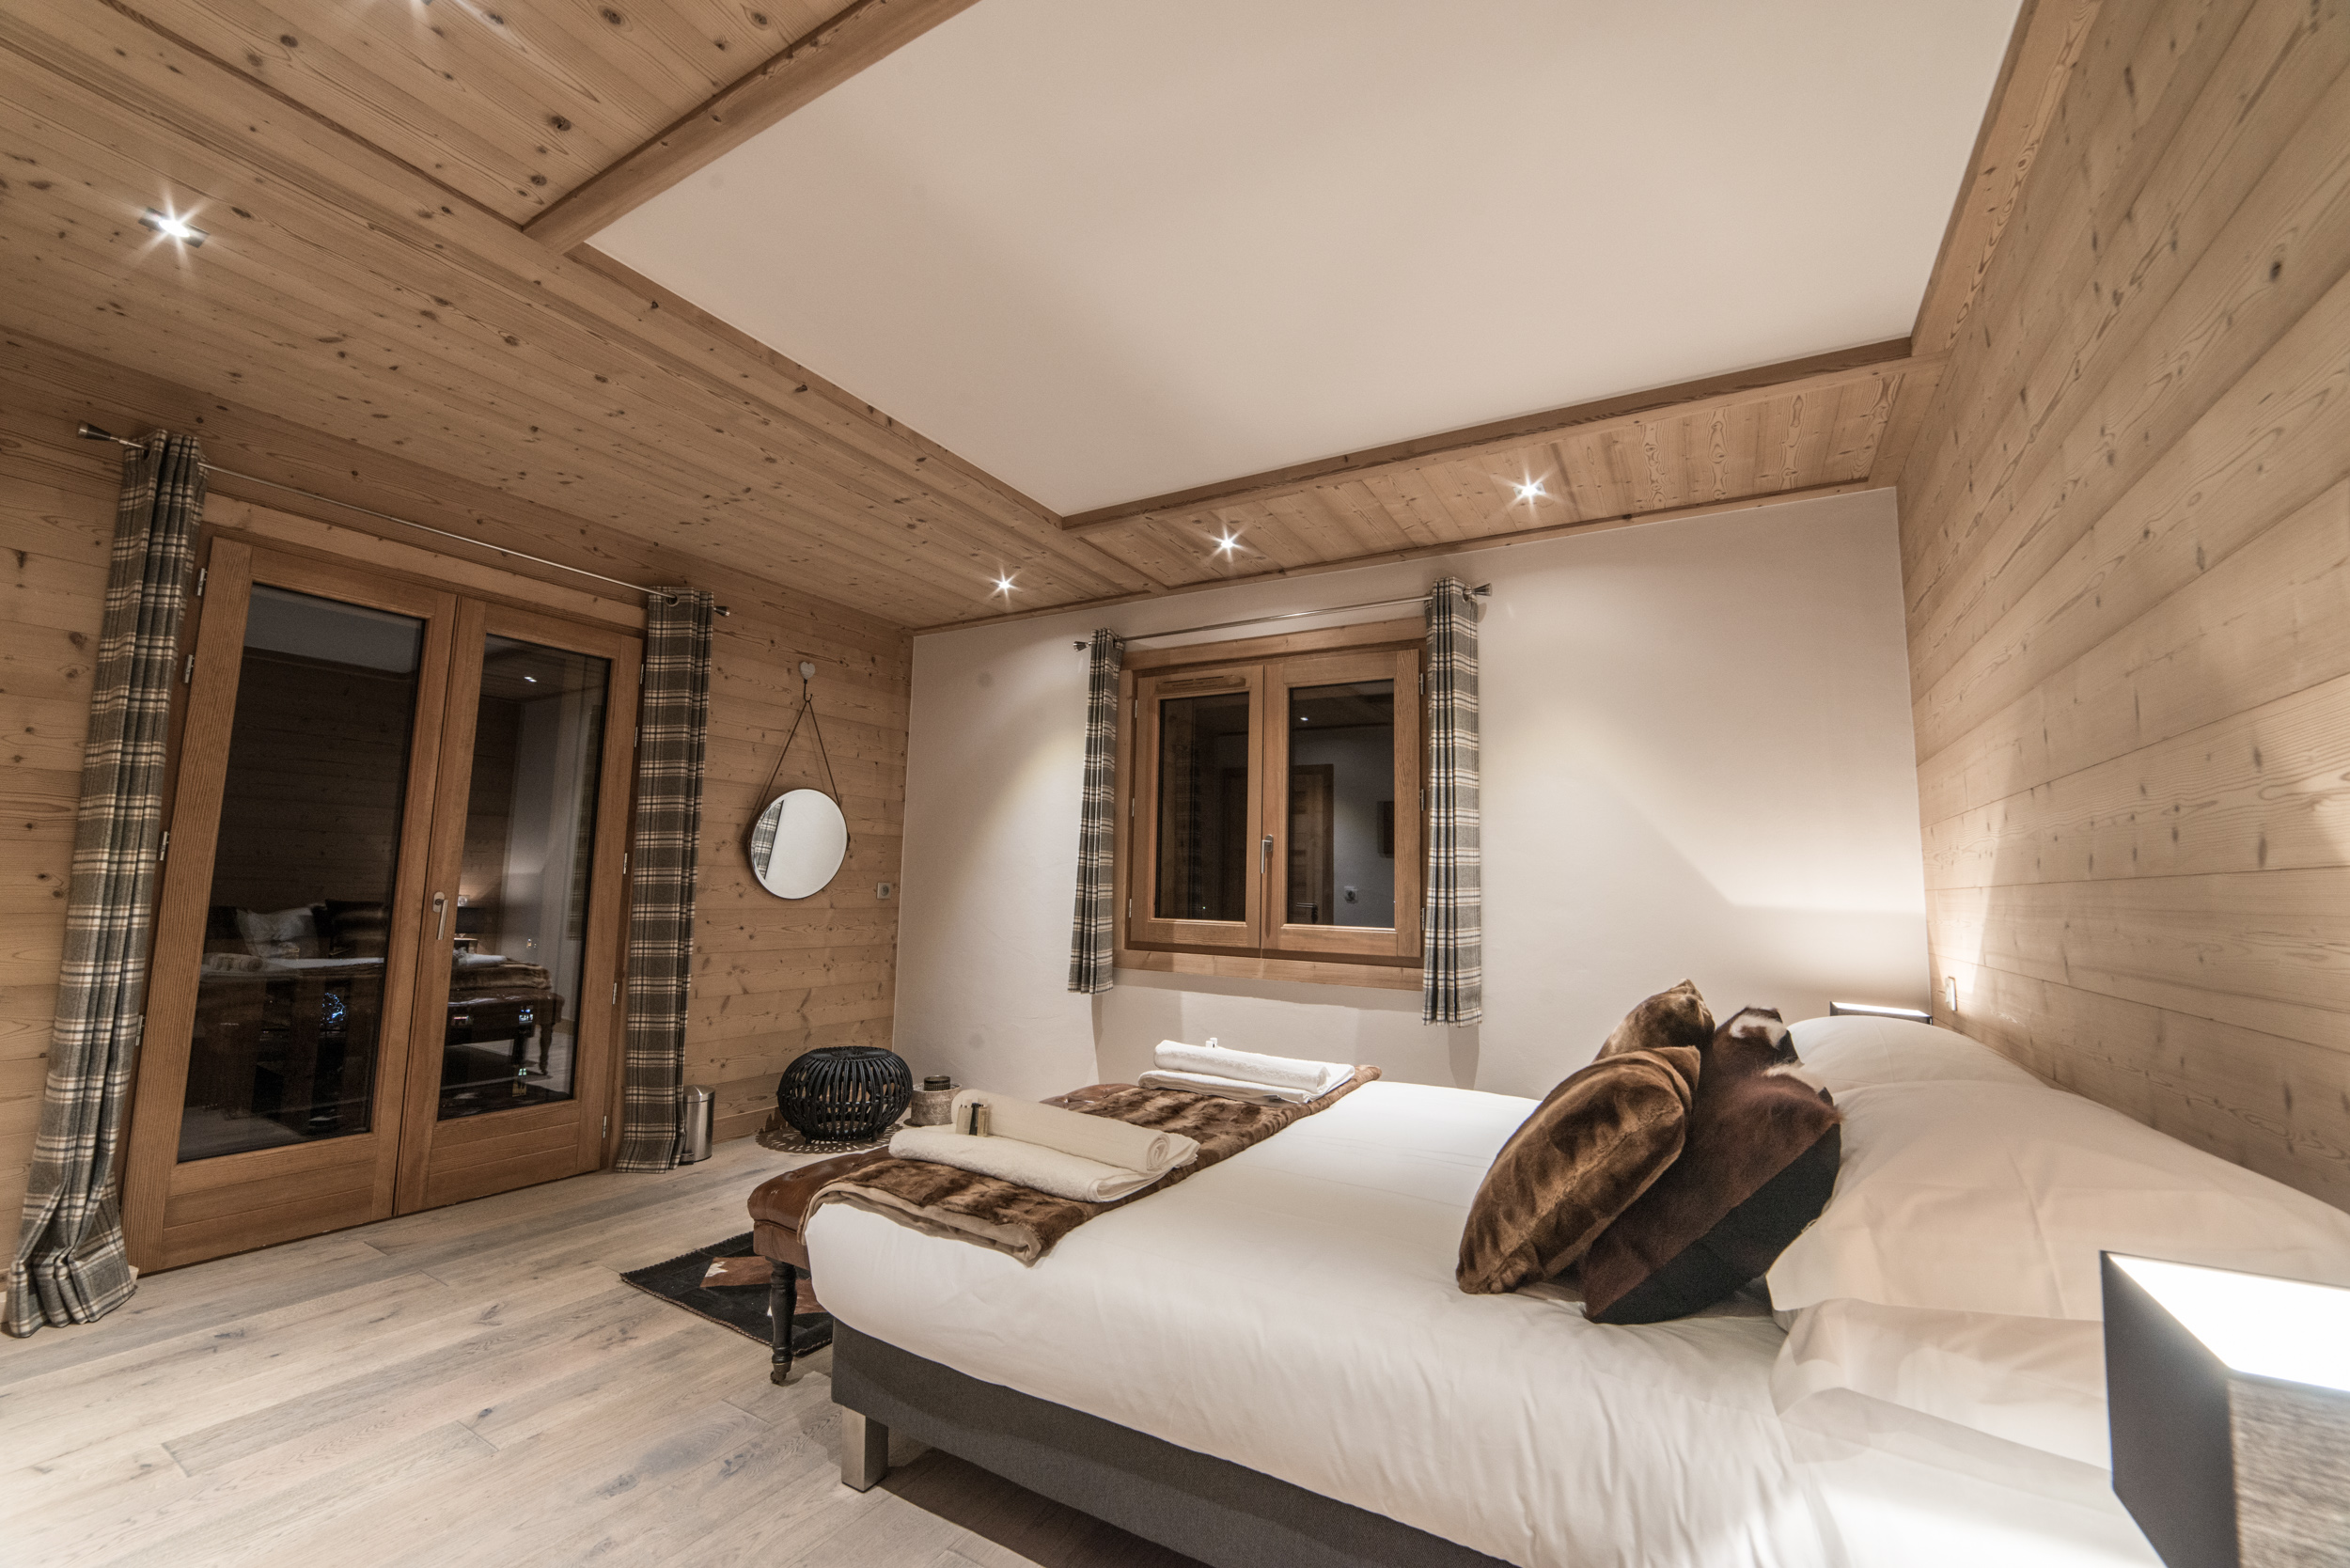 Les Pierrys bedroom 1